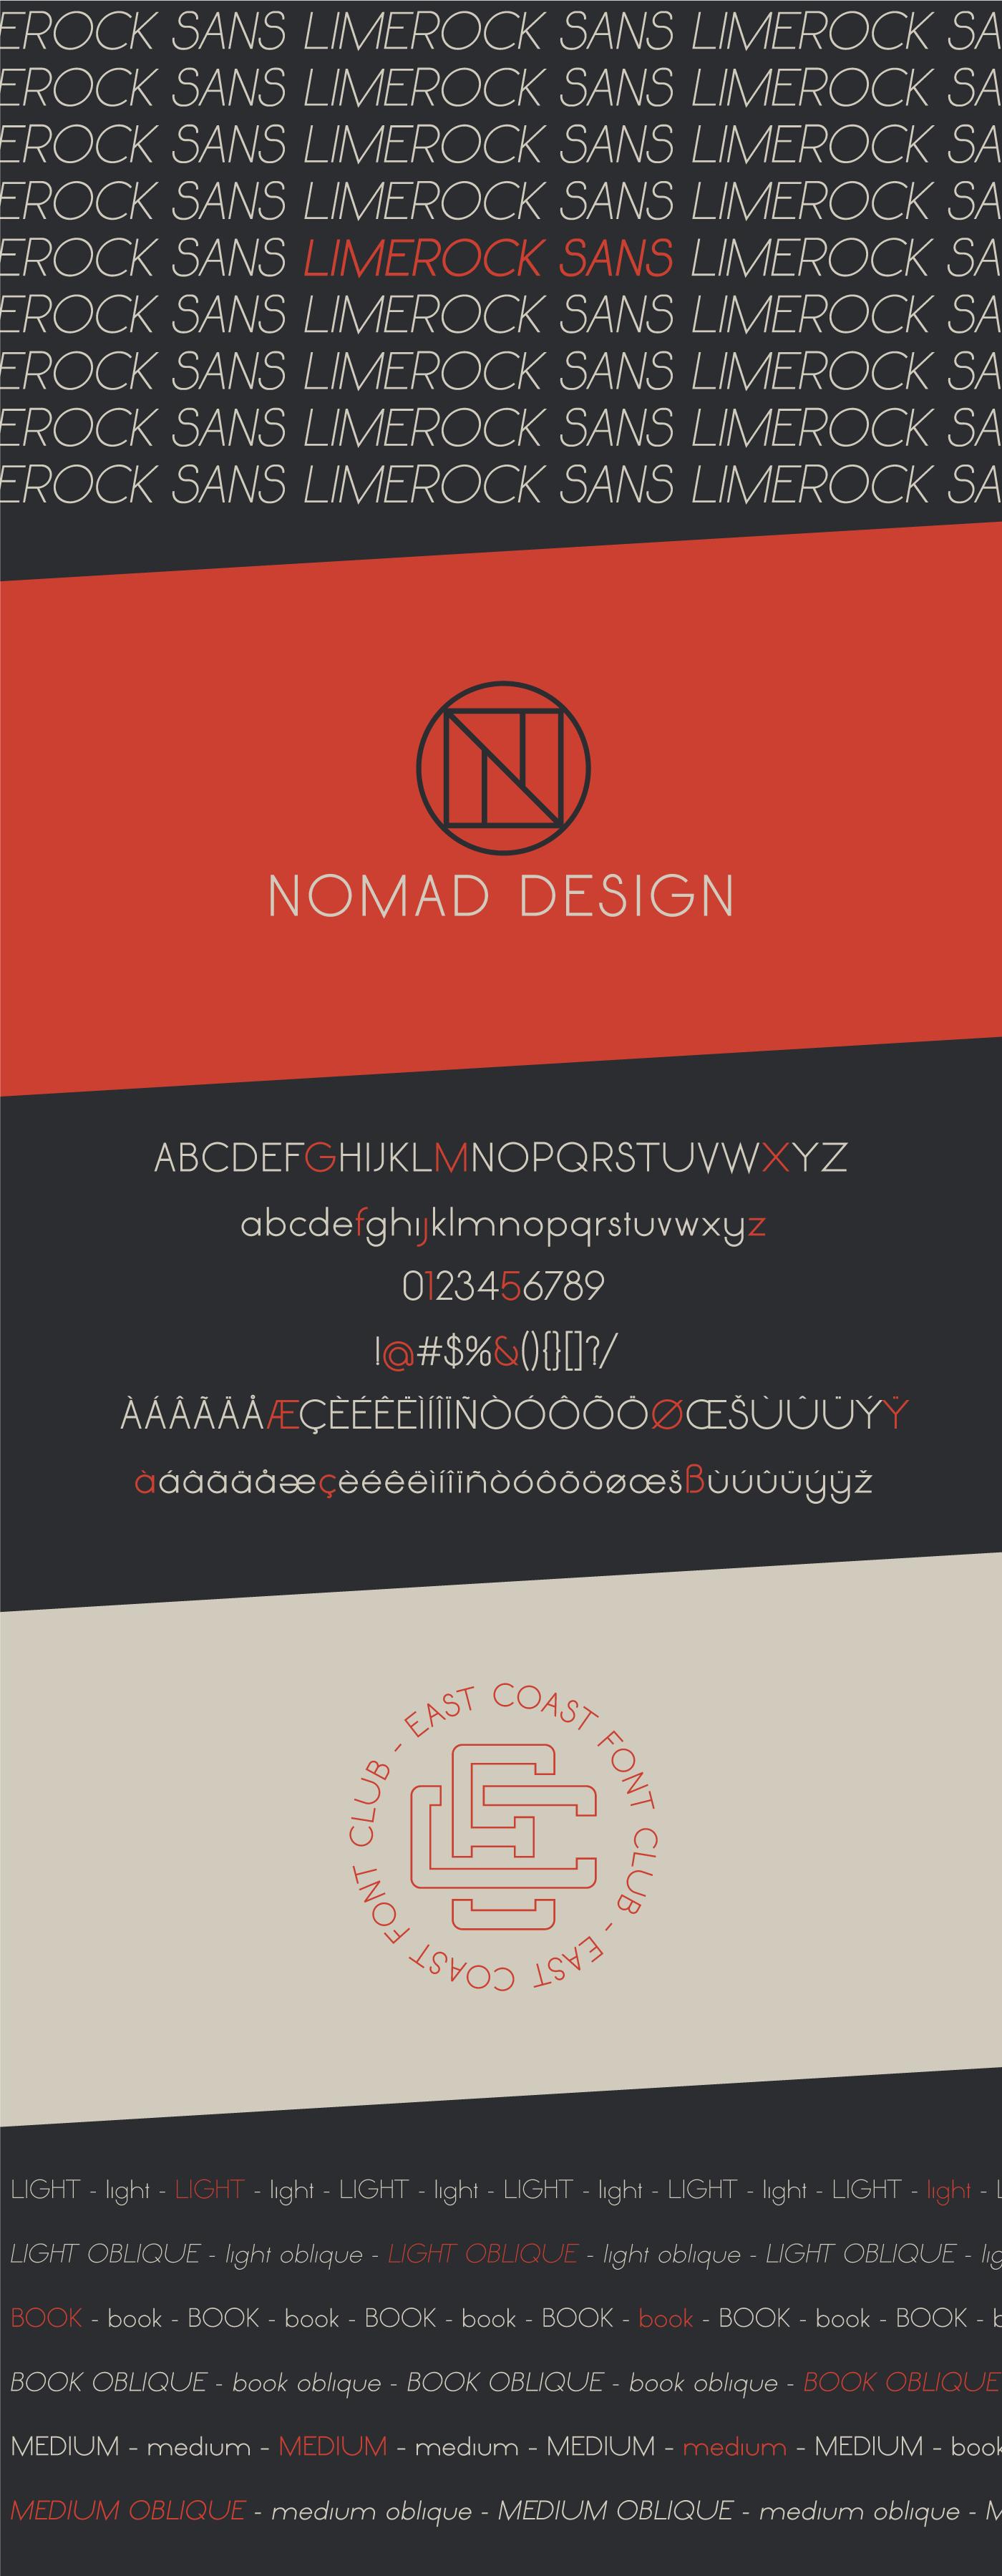 design font free Free font freebie sans serif Script serif type Typeface